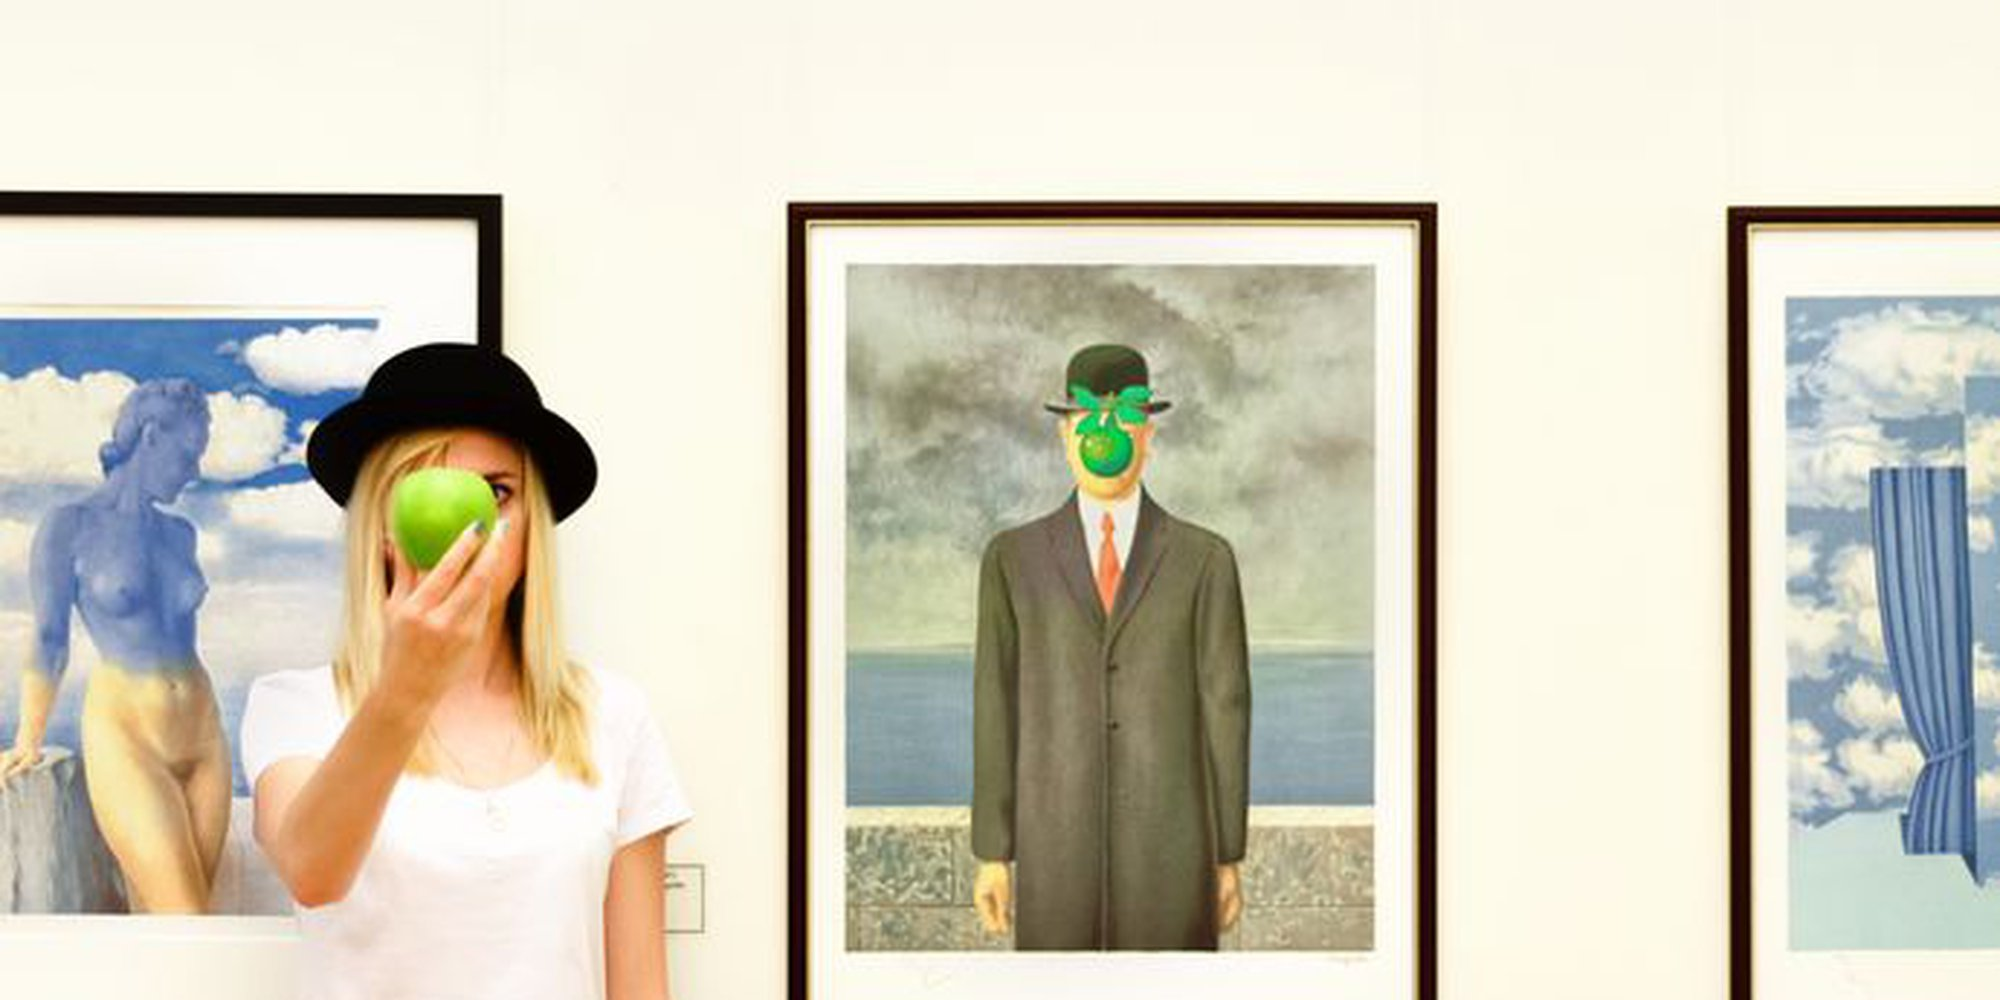 Surrealism: embrace the weird